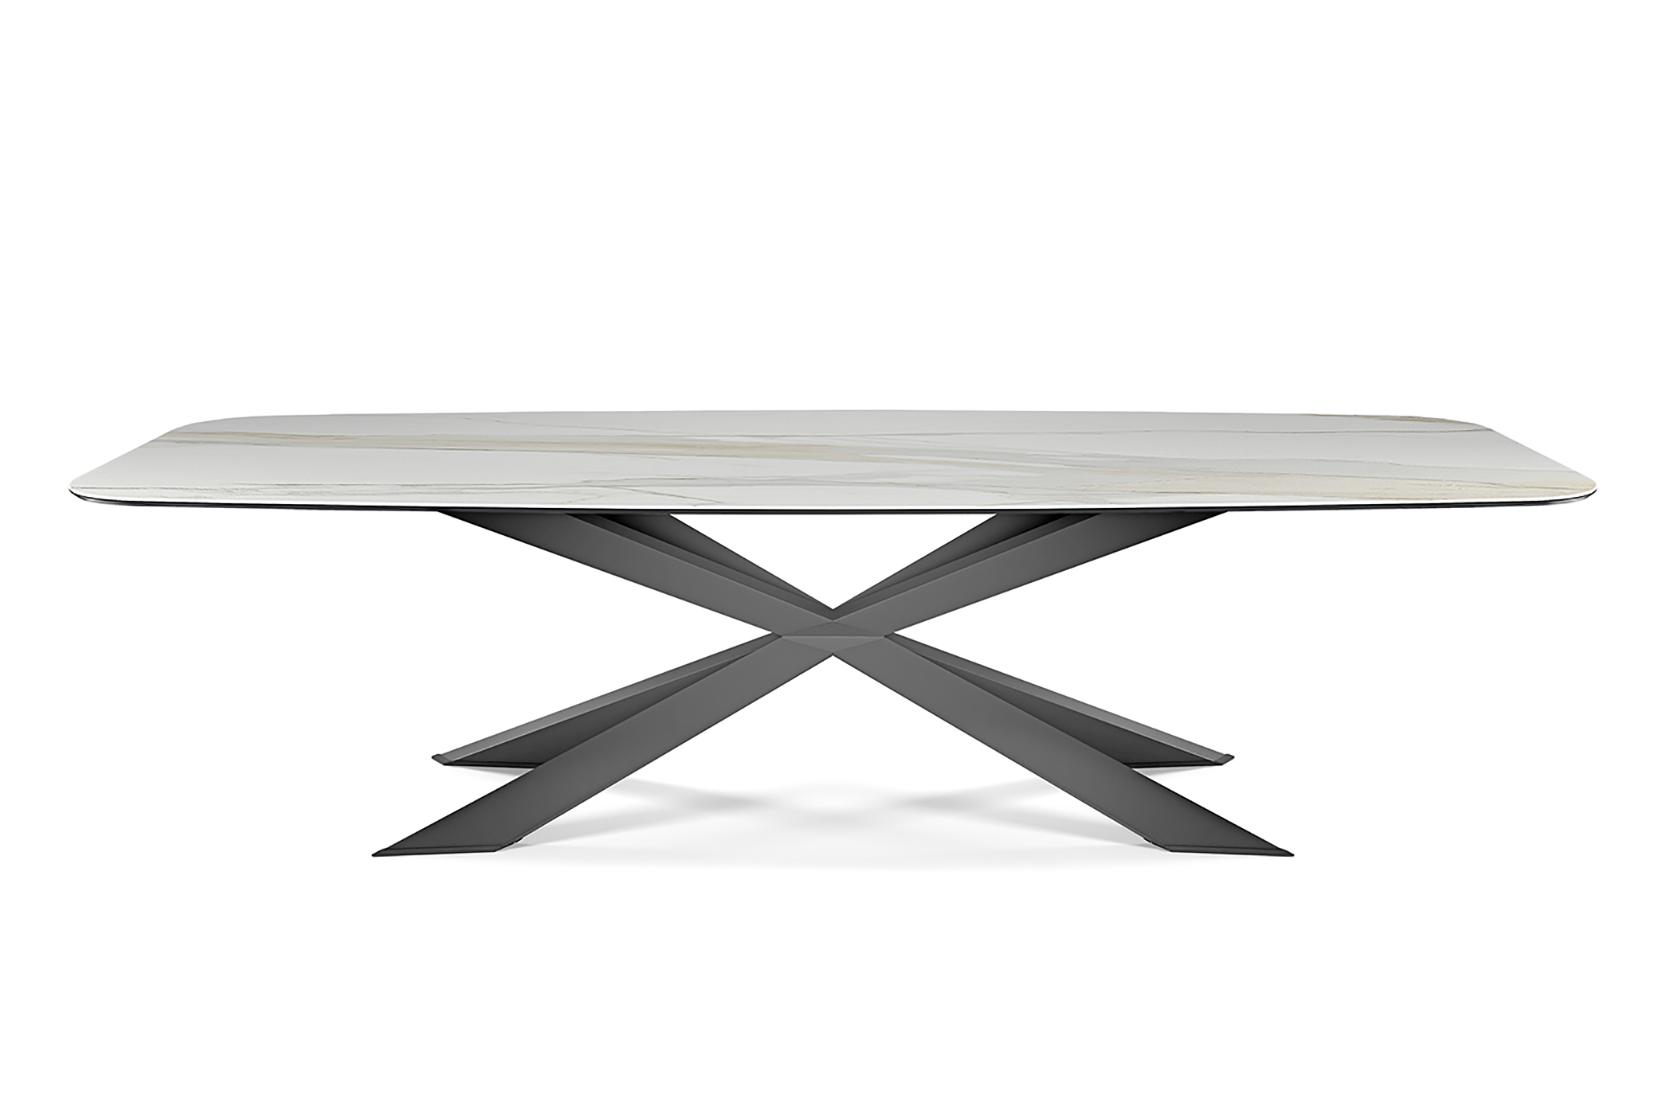 spyder keramik dining table